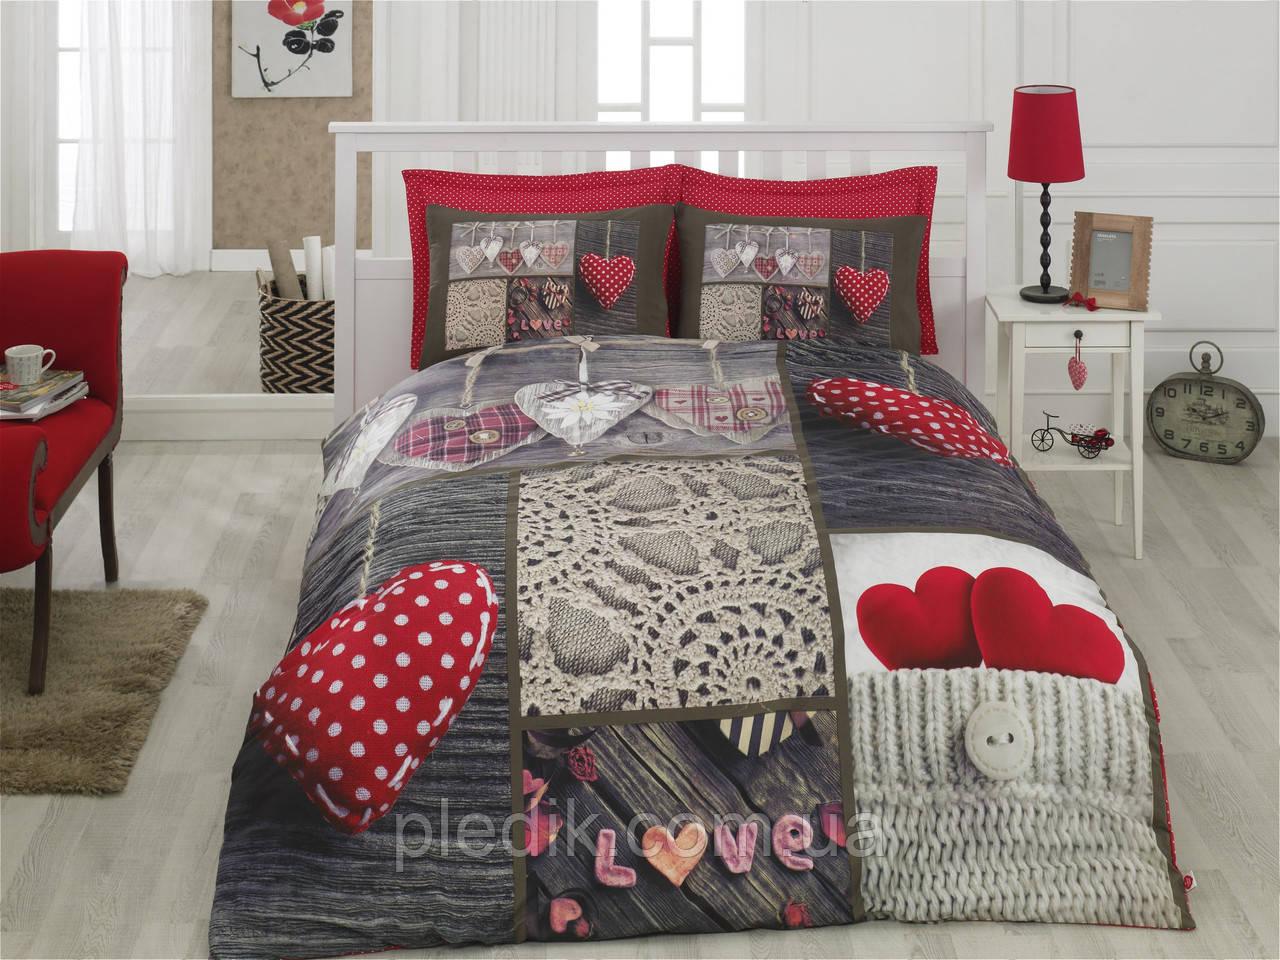 Двуспальное постельное белье 200х220 Cotton box 3D Ранфорс NINA KIRMIZI